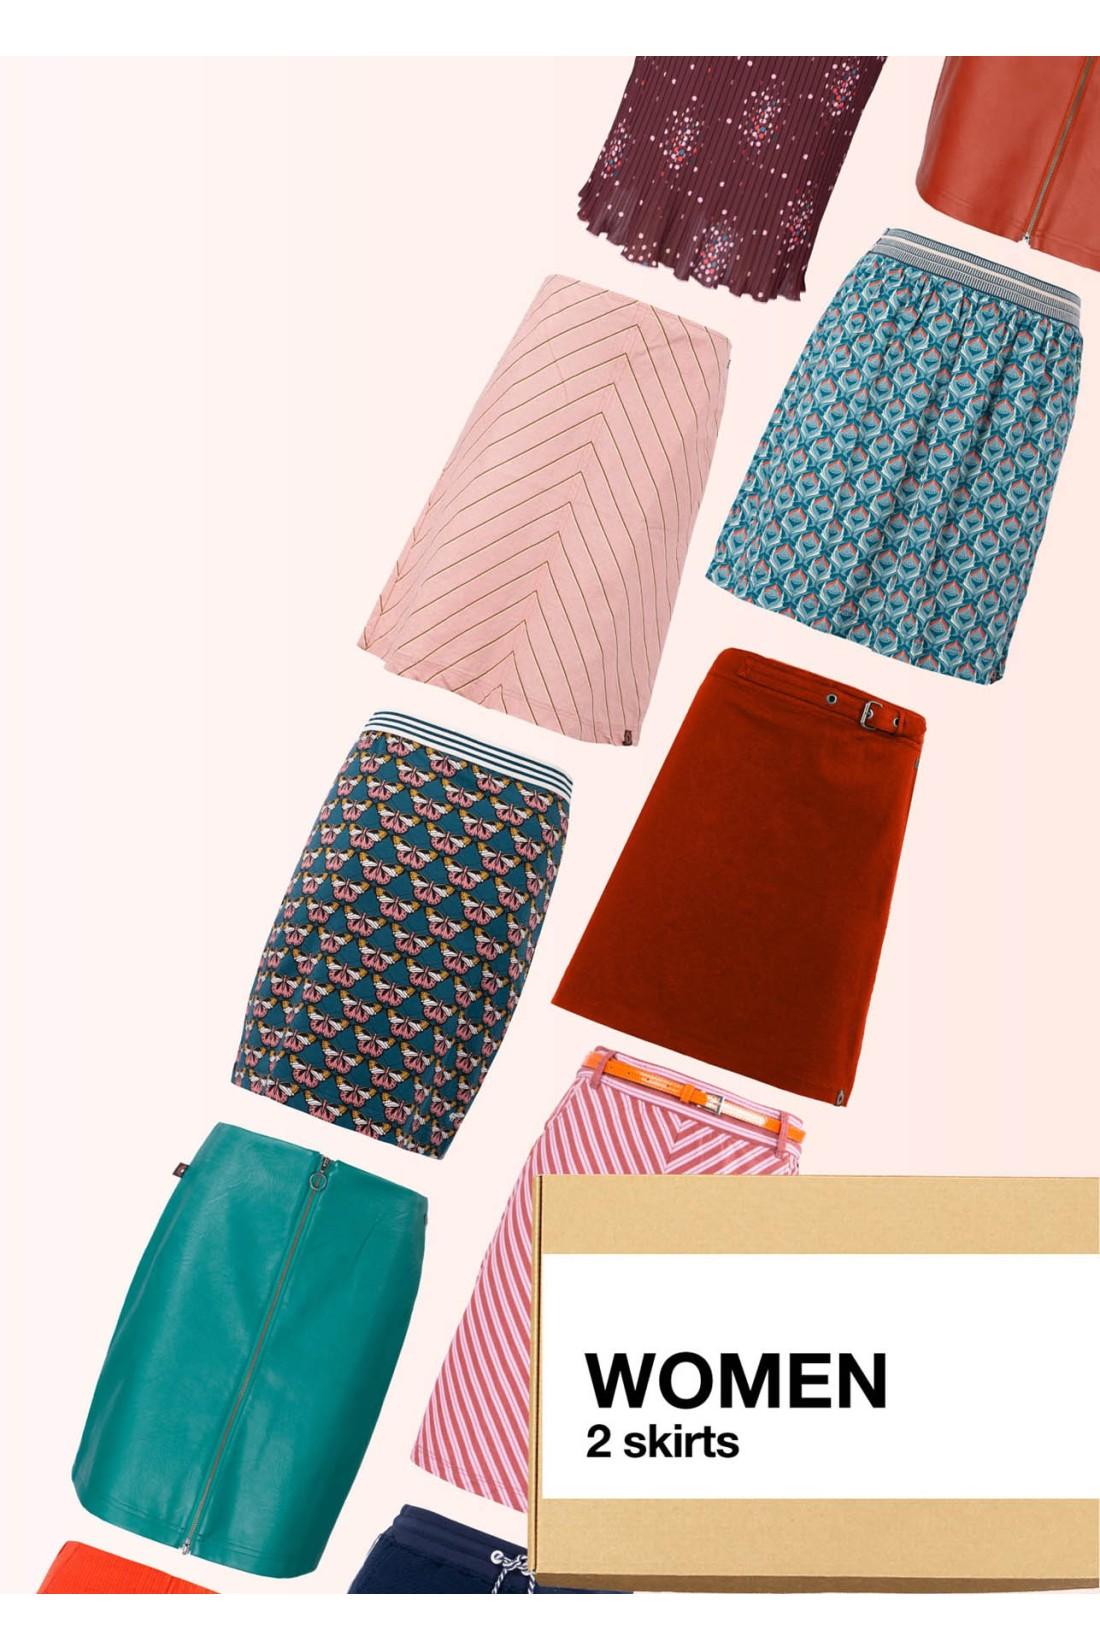 Surprise Box Women - 2 Skirts